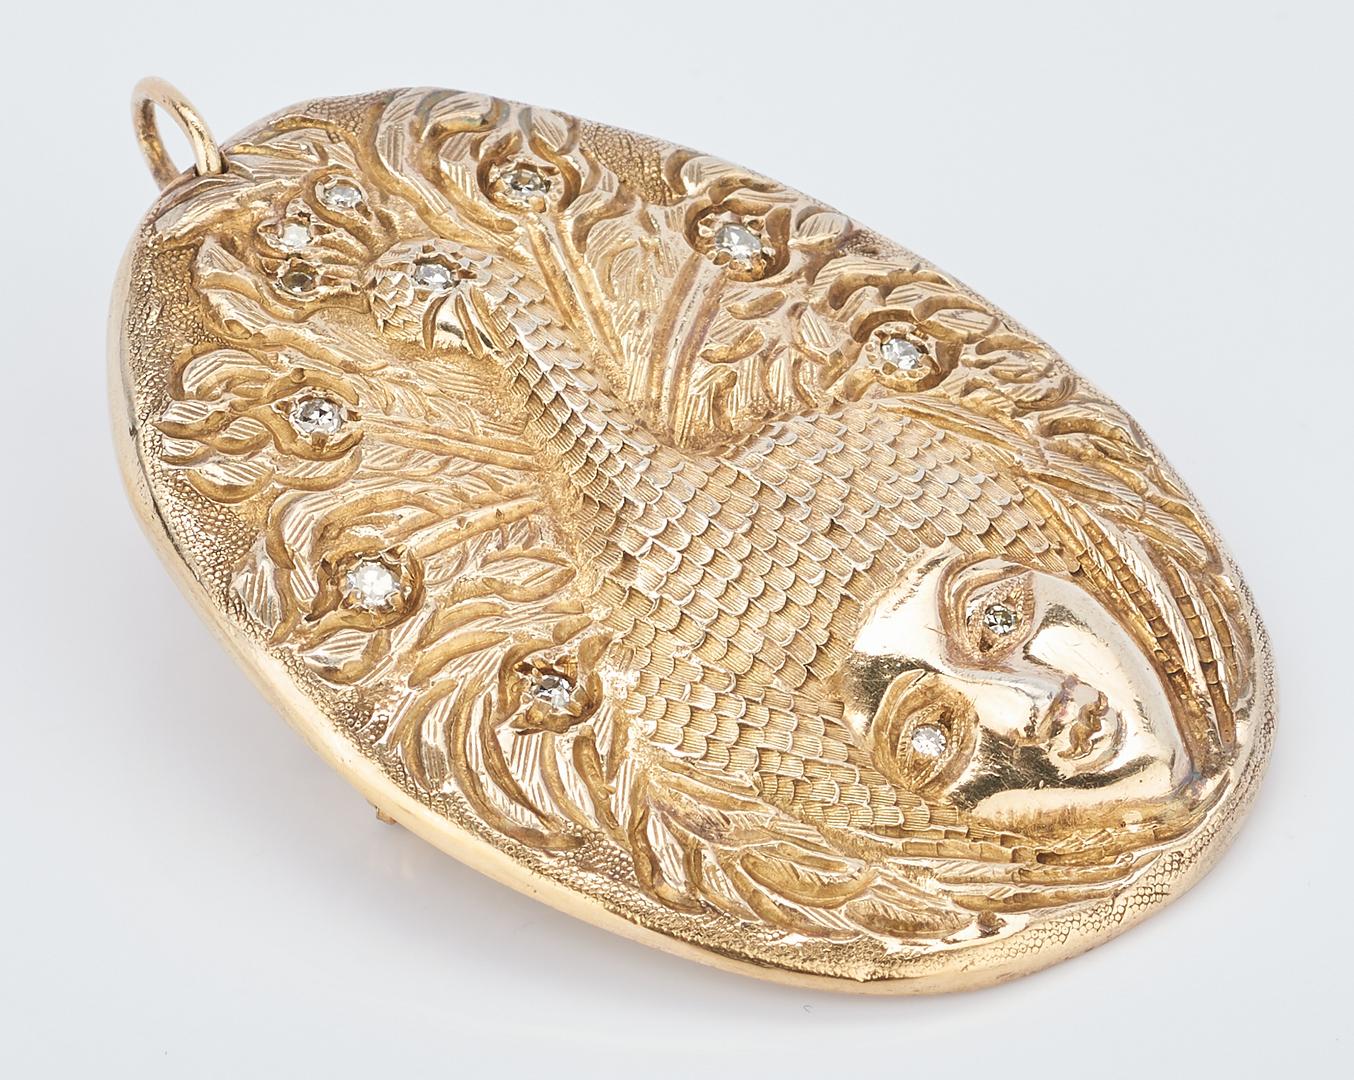 Lot 719: 14K Art Nouveau Style Gold Brooch w/ Diamonds